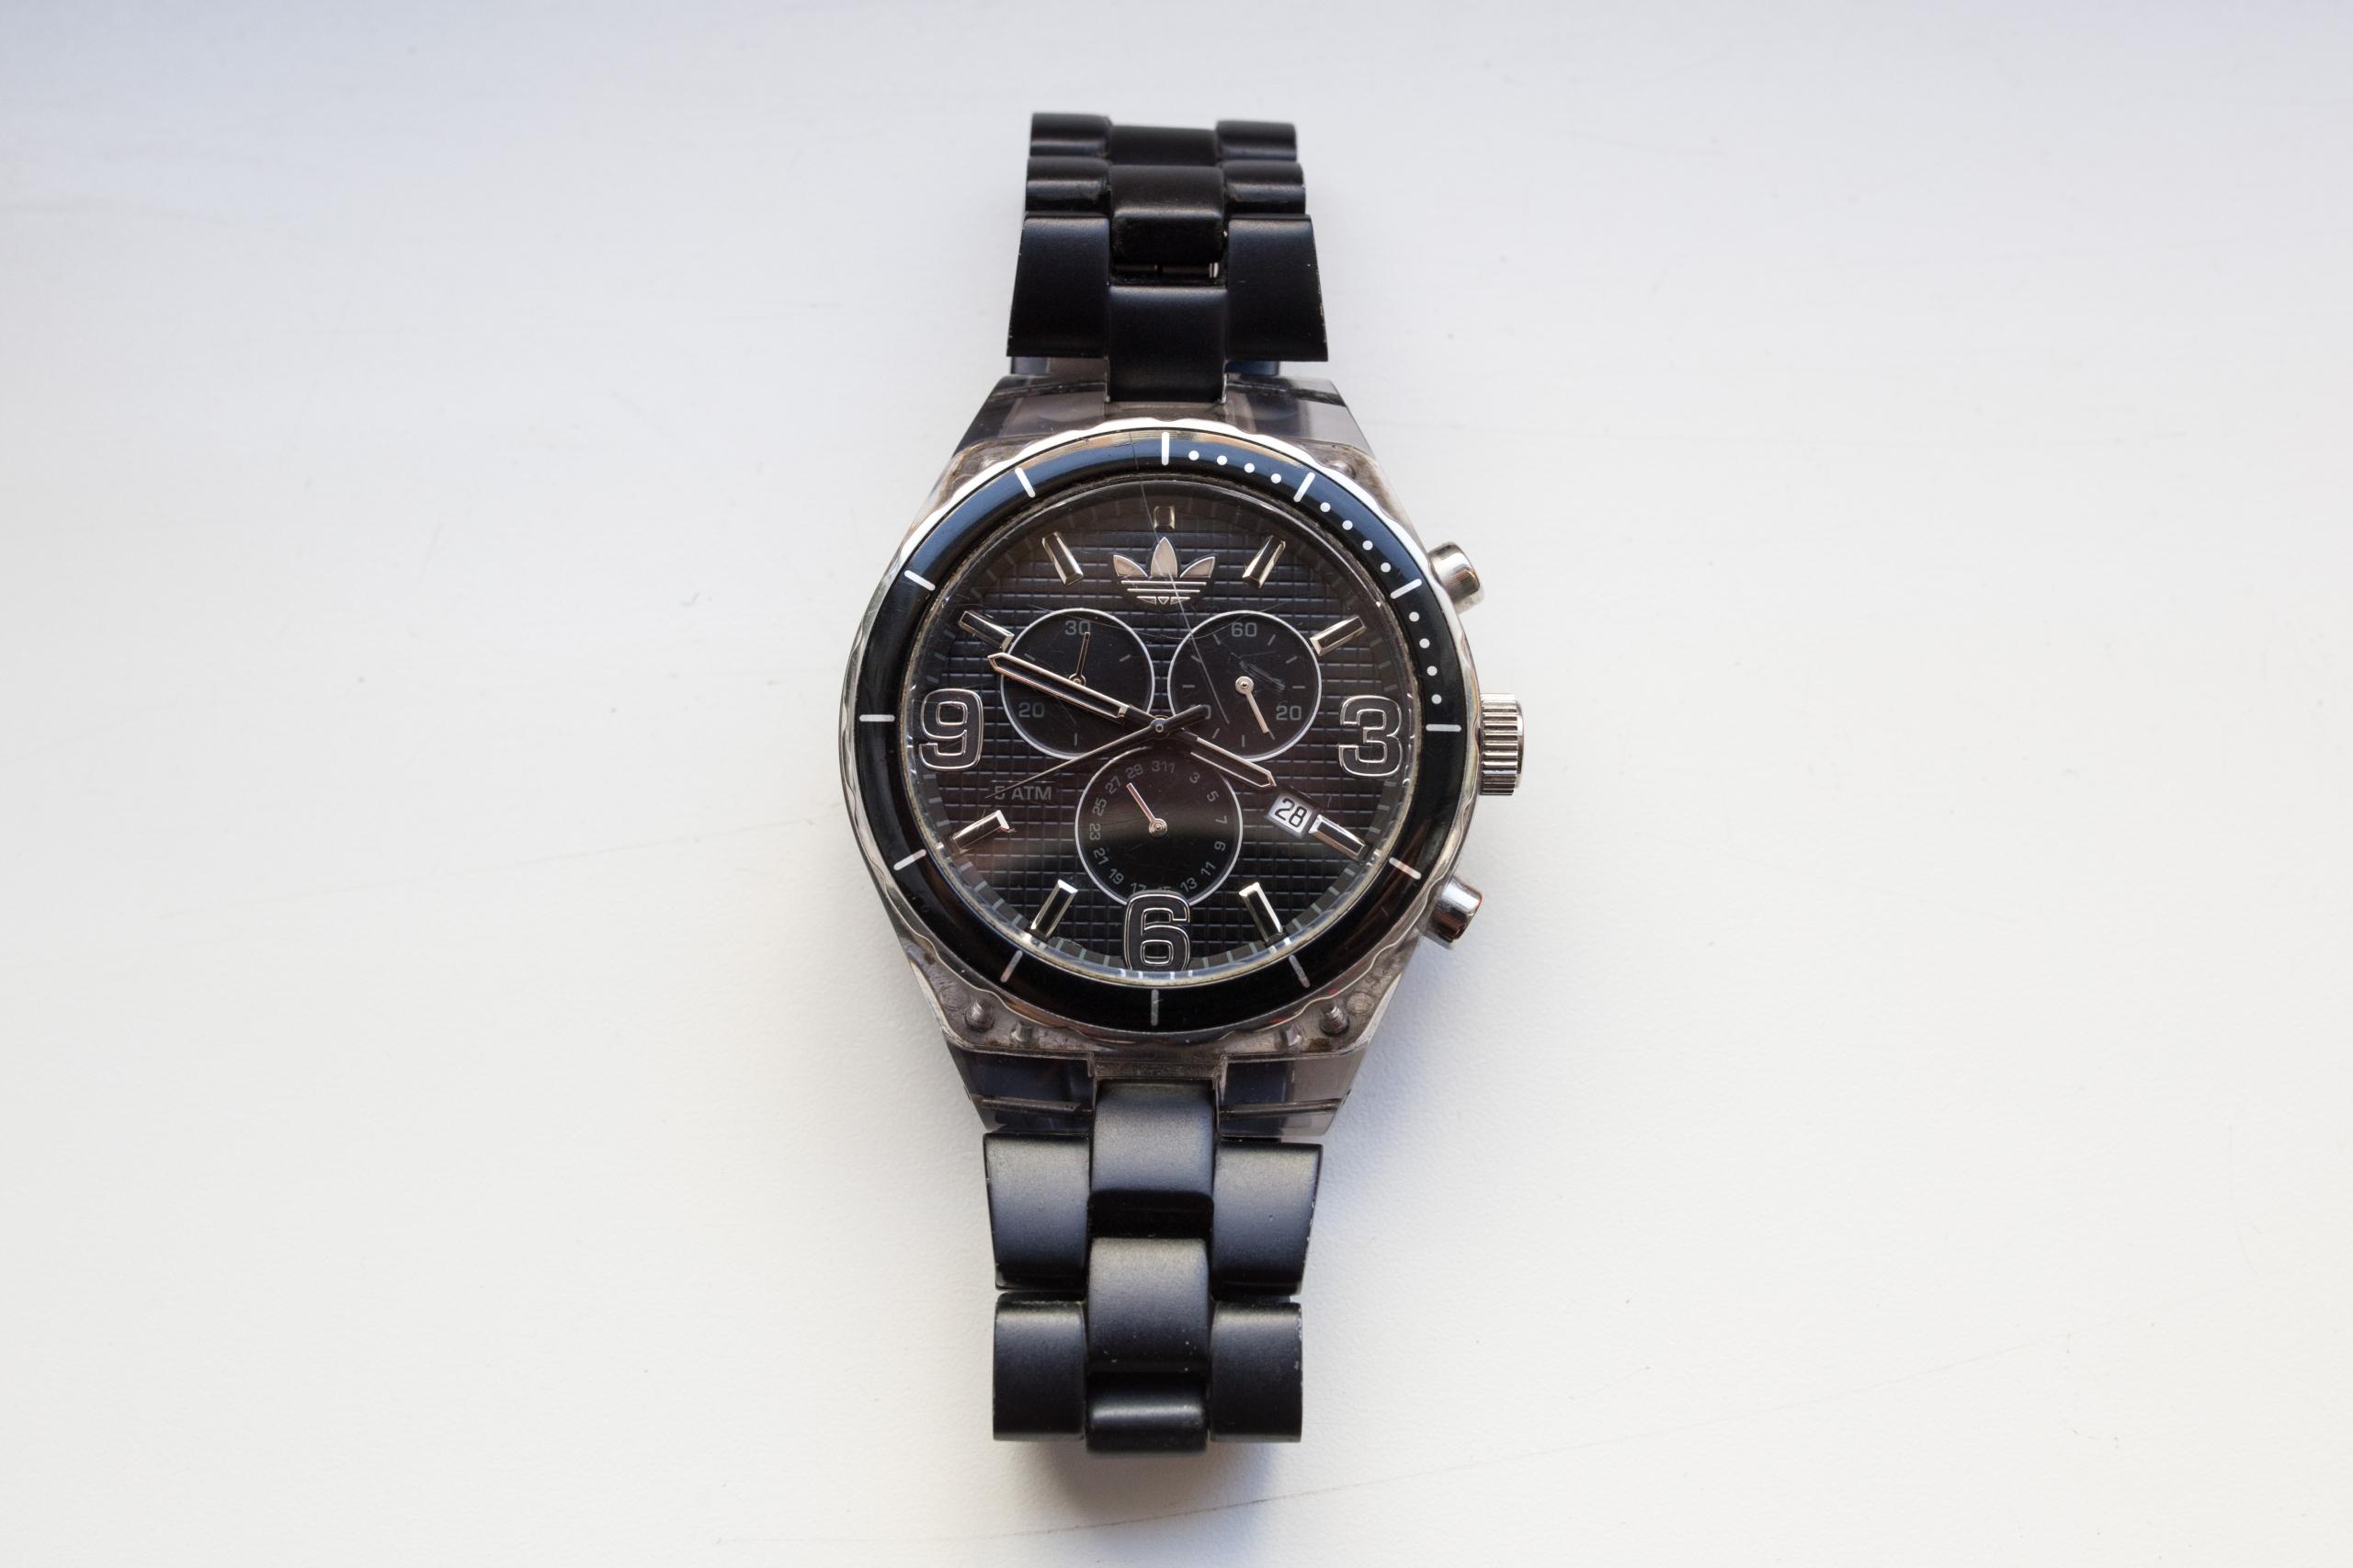 6fccdf9ad0b29 Zegarek ADIDAS czarny ADH2542 Cambridge - 7650573656 - oficjalne ...